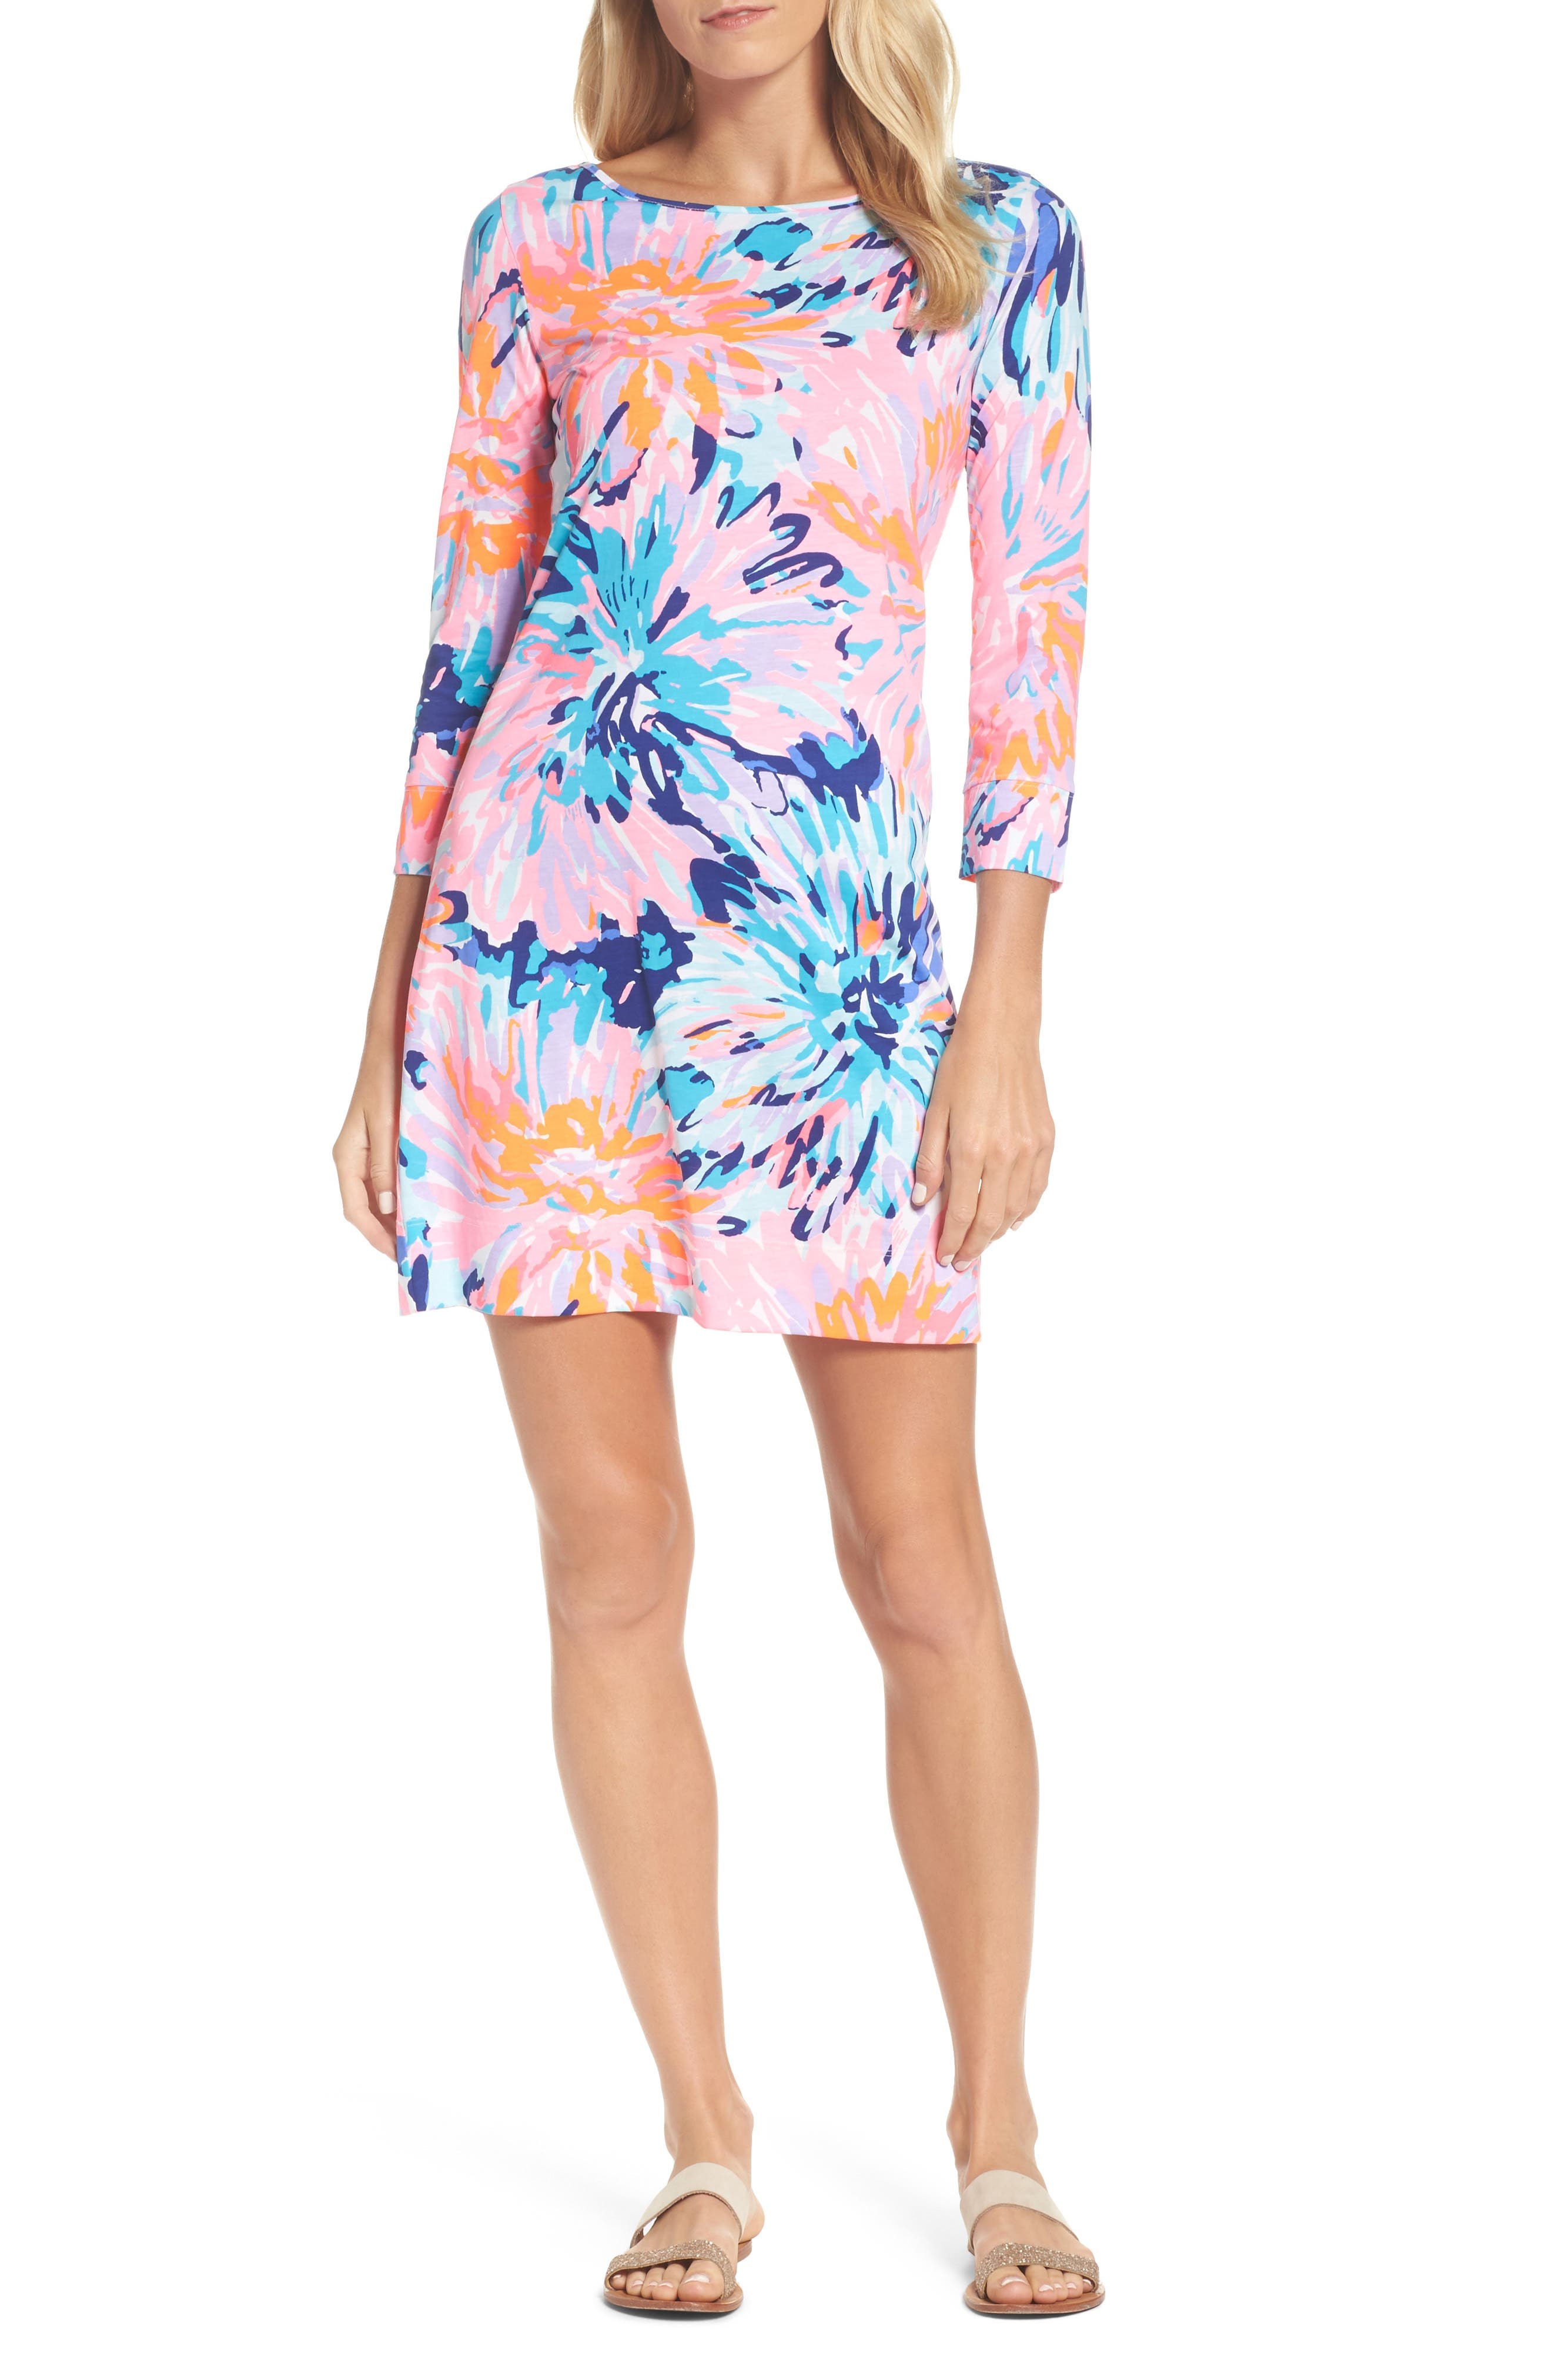 Main Image - Lilly Pulitzer® Marlowe T-Shirt Dress